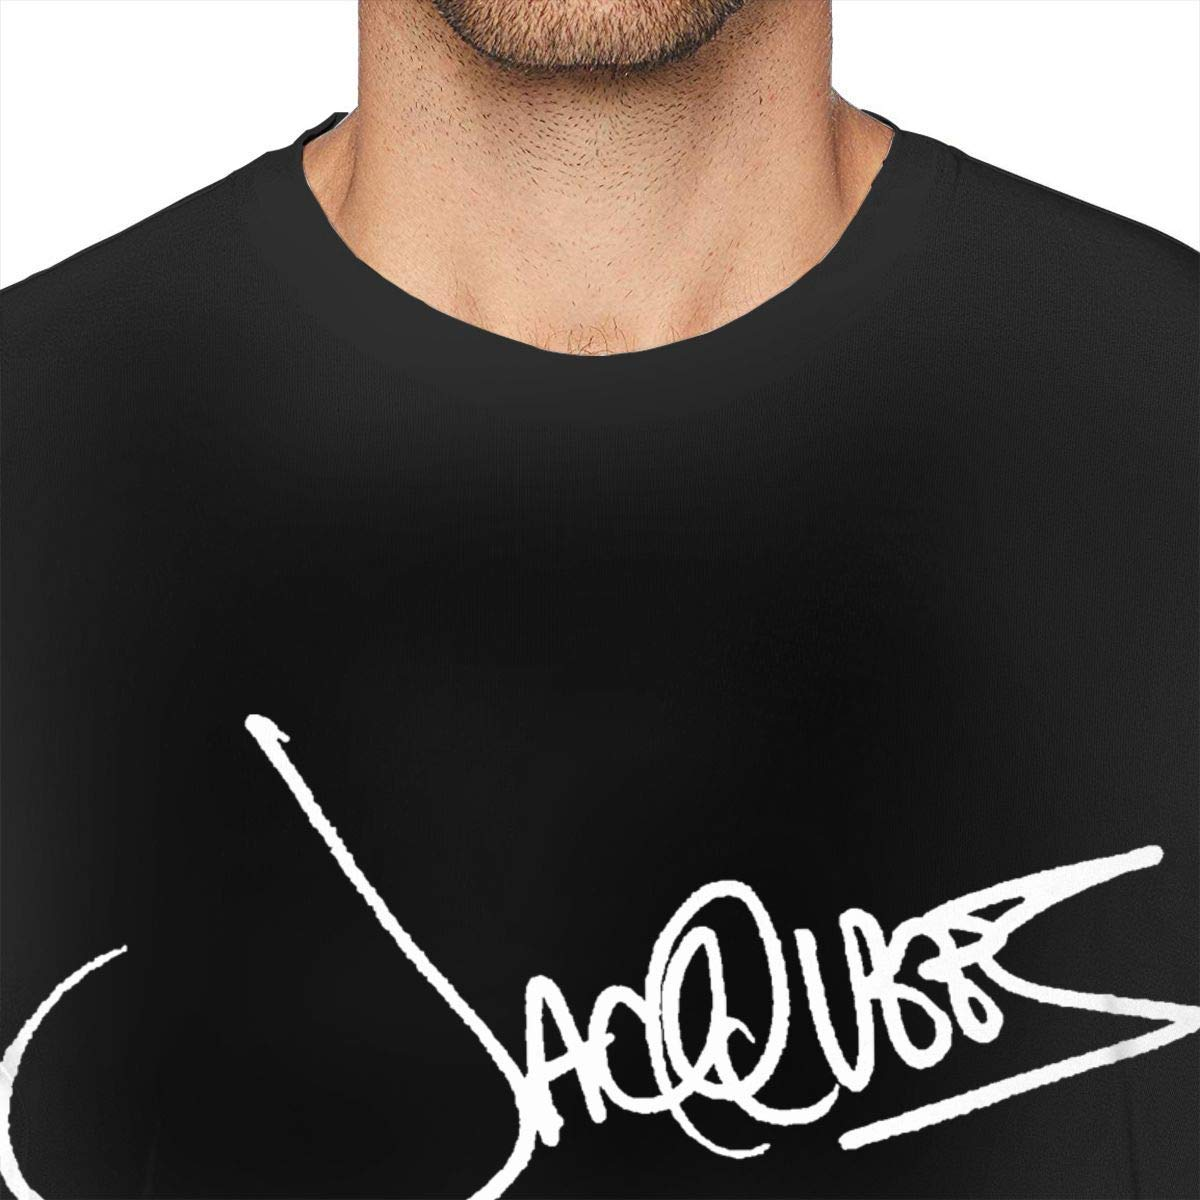 Kjods Jacquees Mens Shirt Fashion Short Sleeve Black